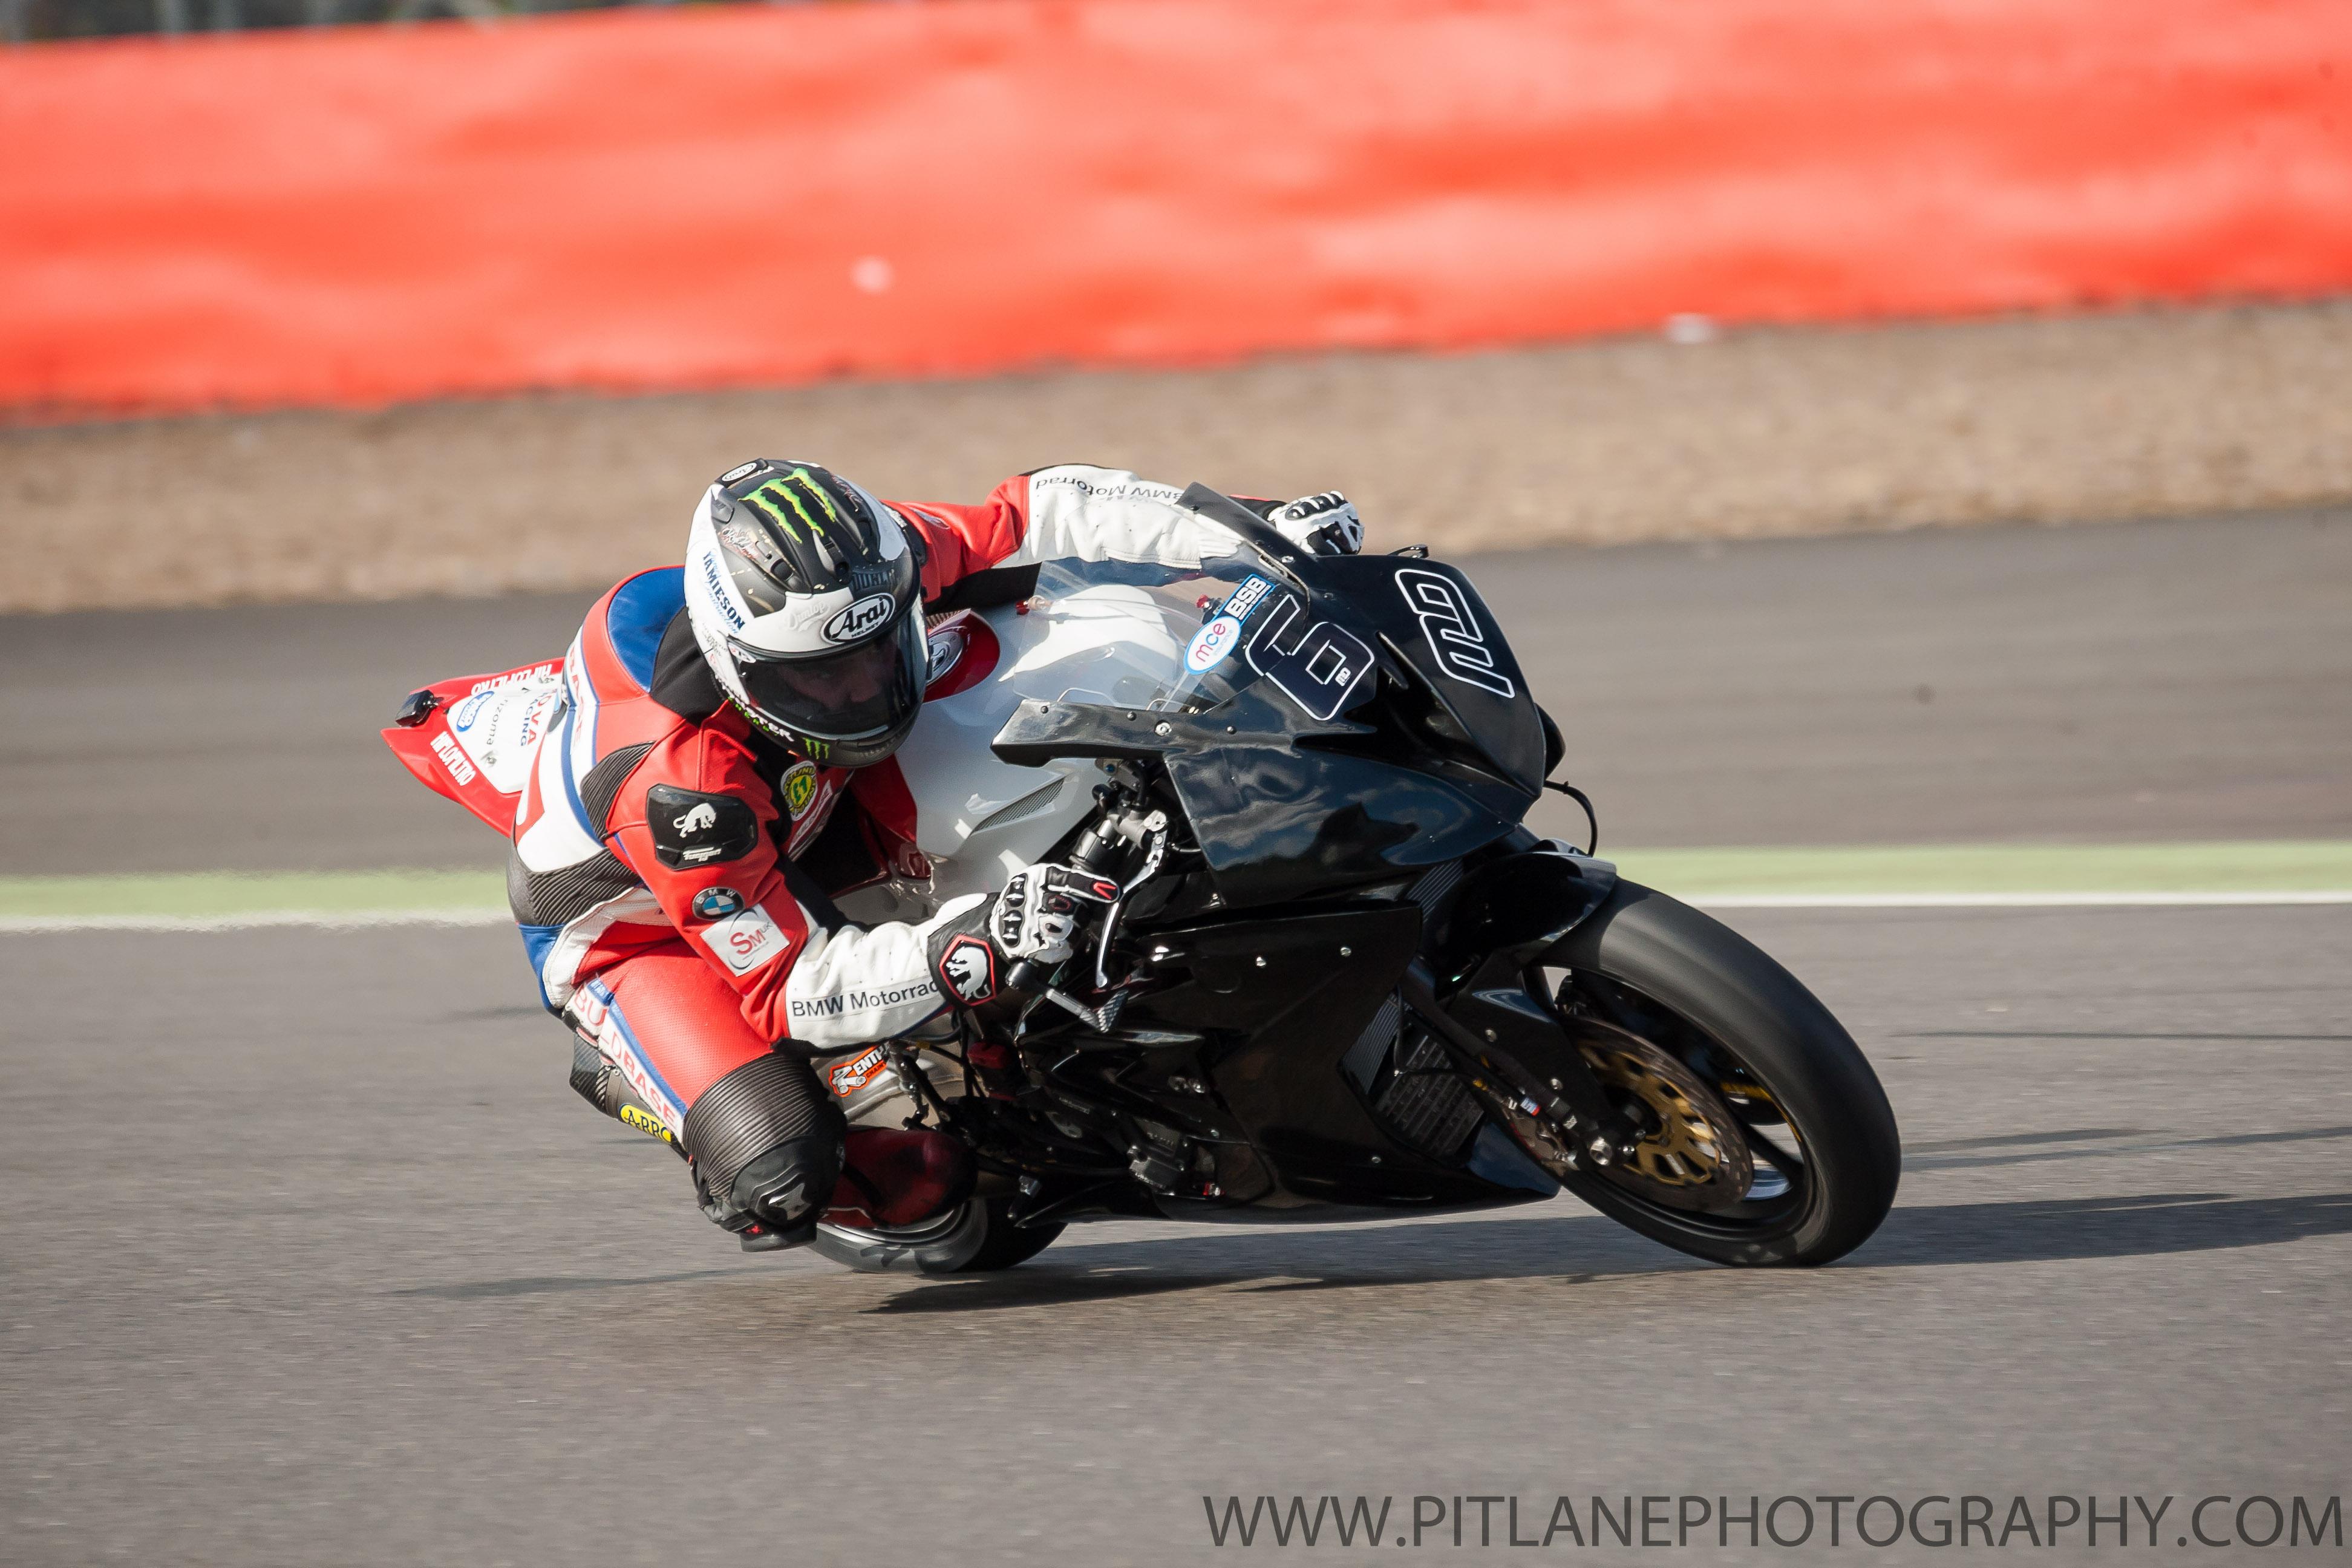 Michael-Dunlop-test-Silverstone-1